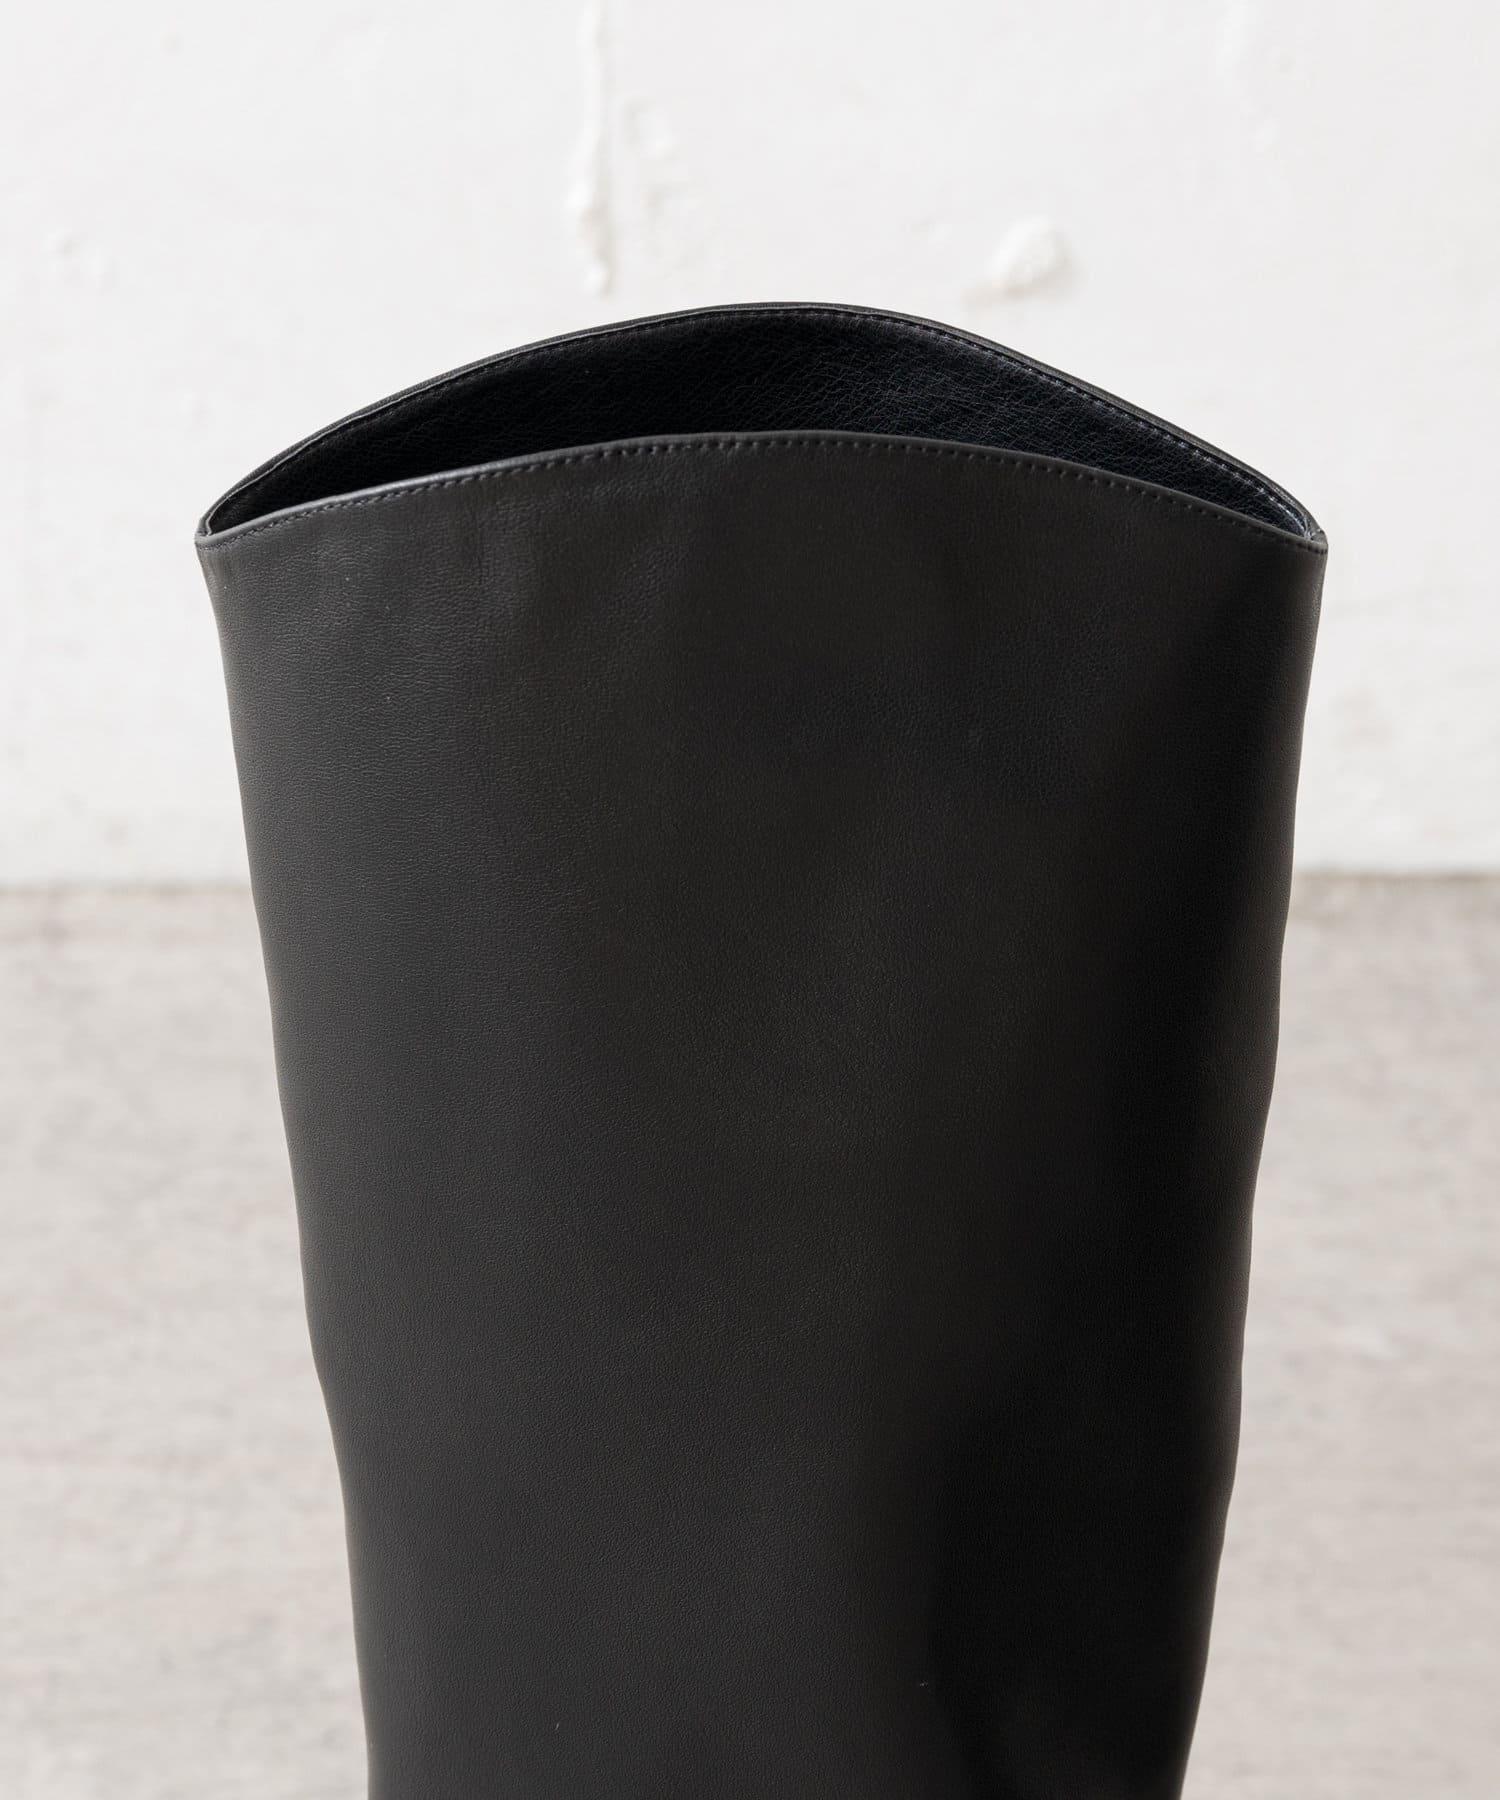 SHENERY(シーナリー) カウレザーロングブーツ